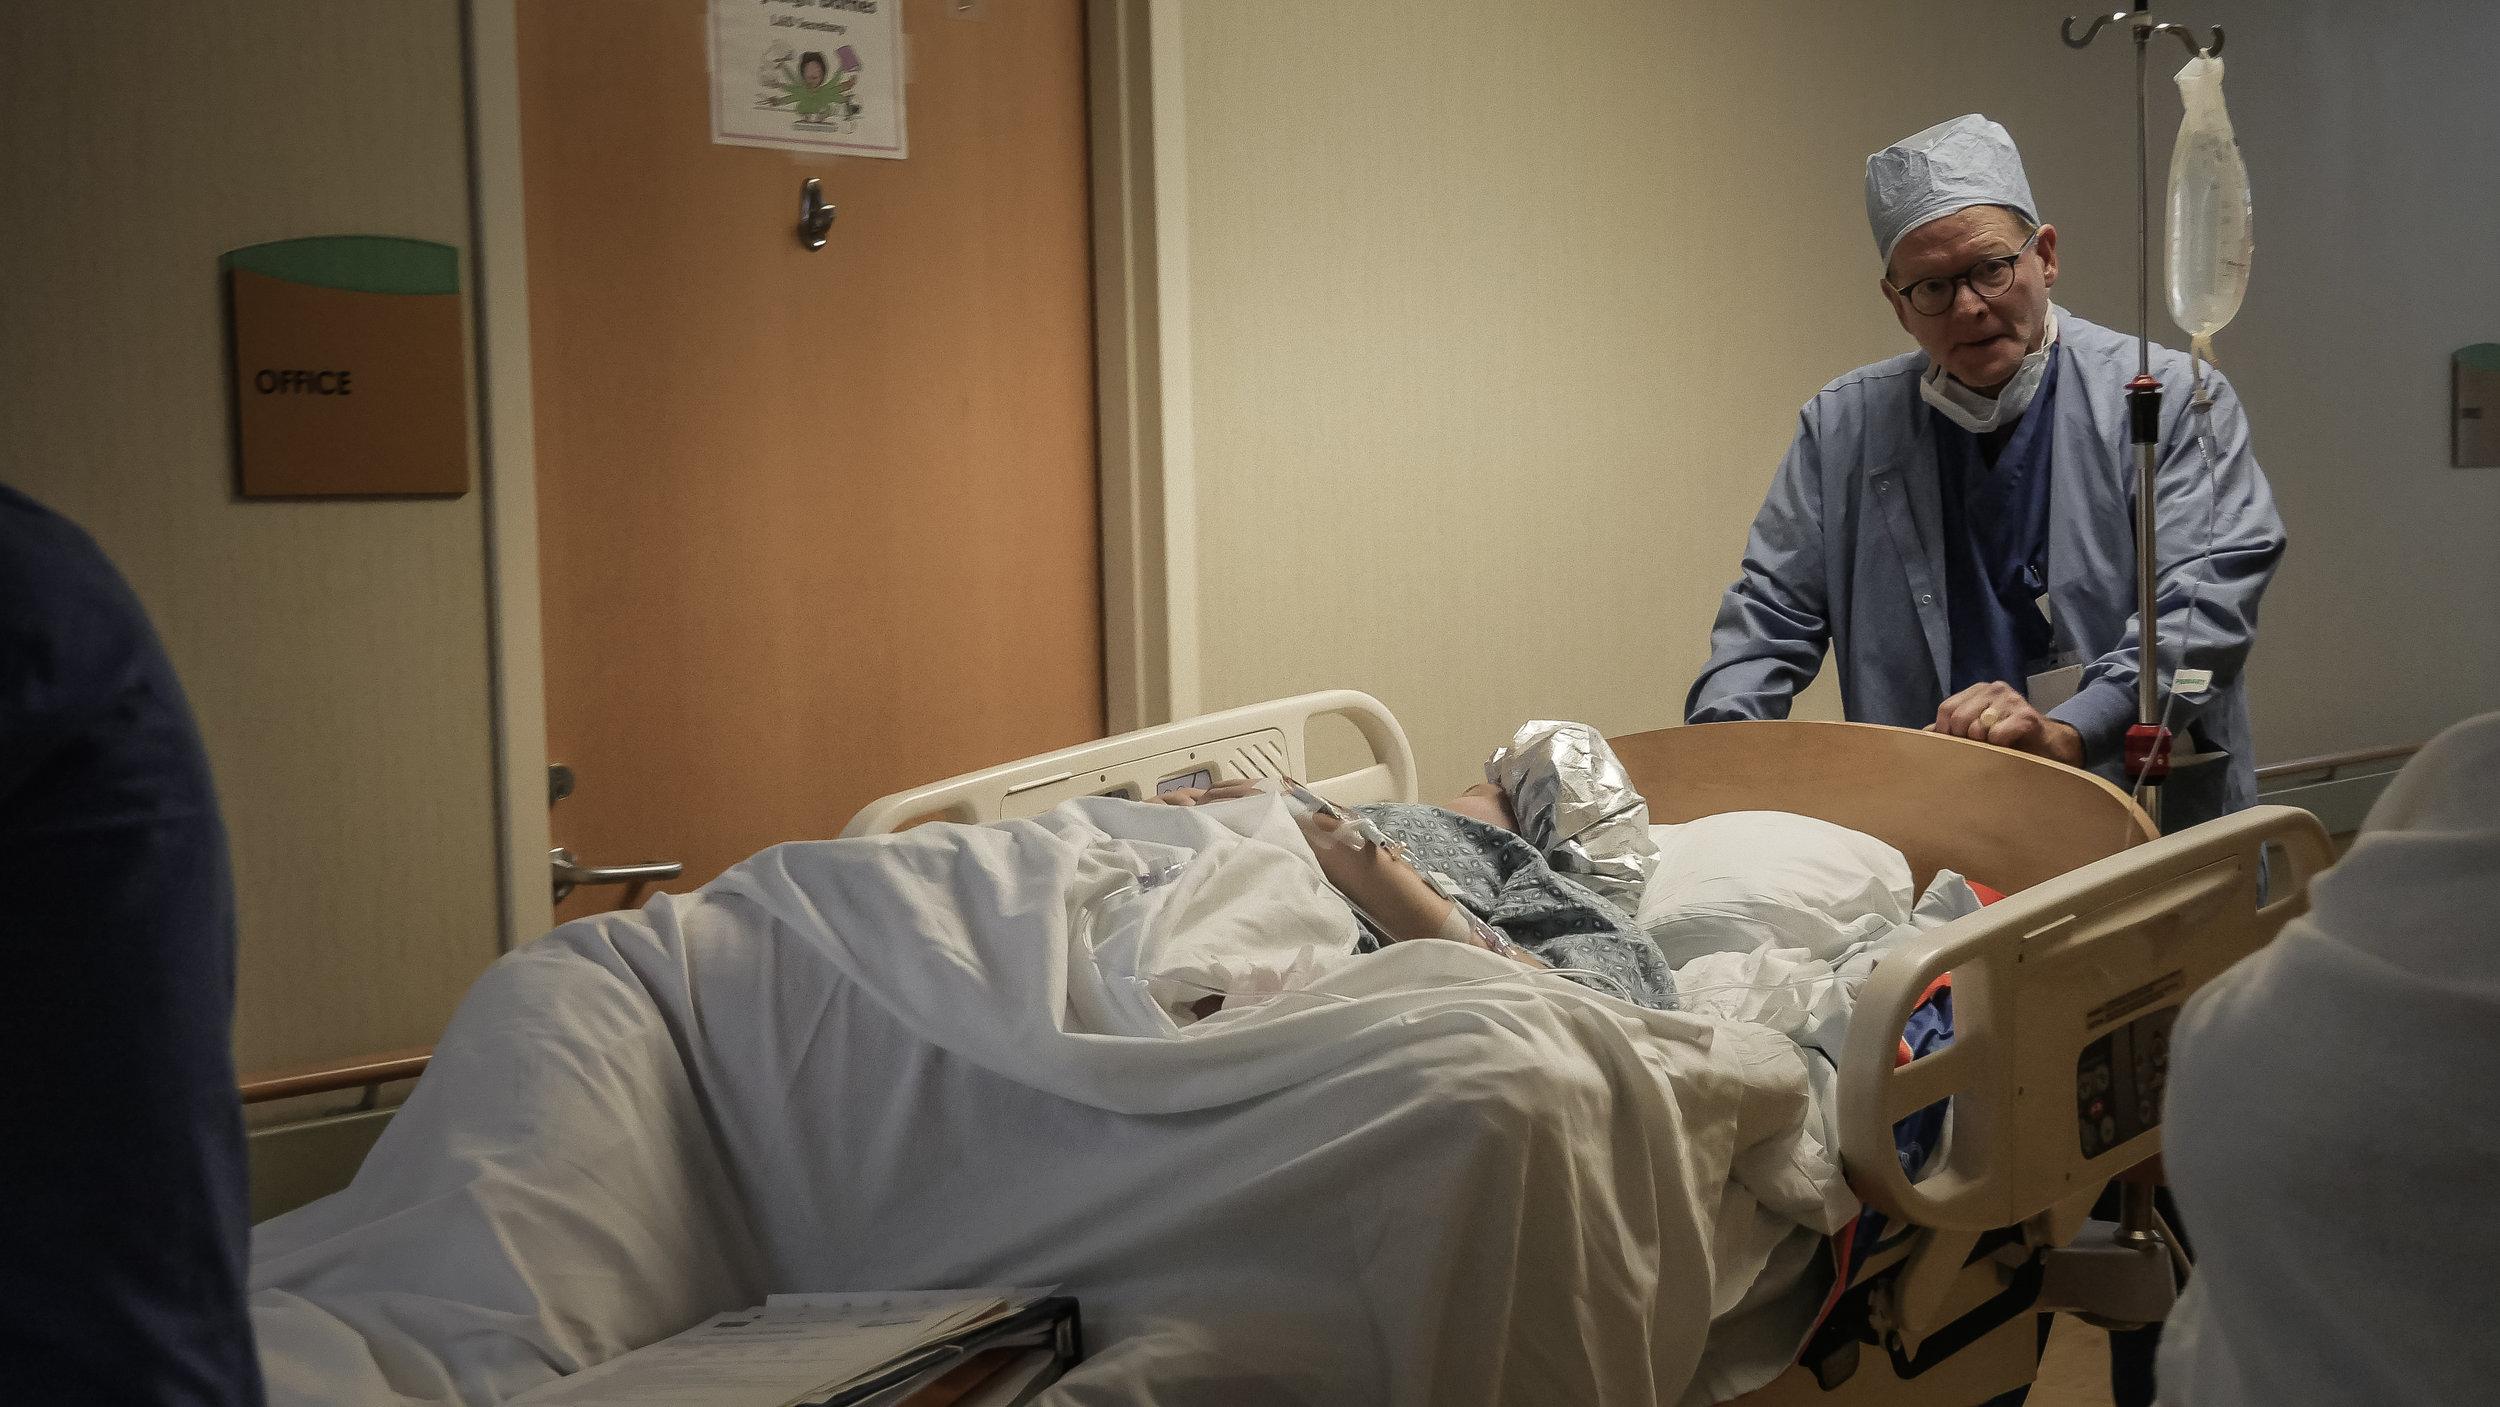 7-22-18 - Baby Gary Hospital Shoot00104.jpg